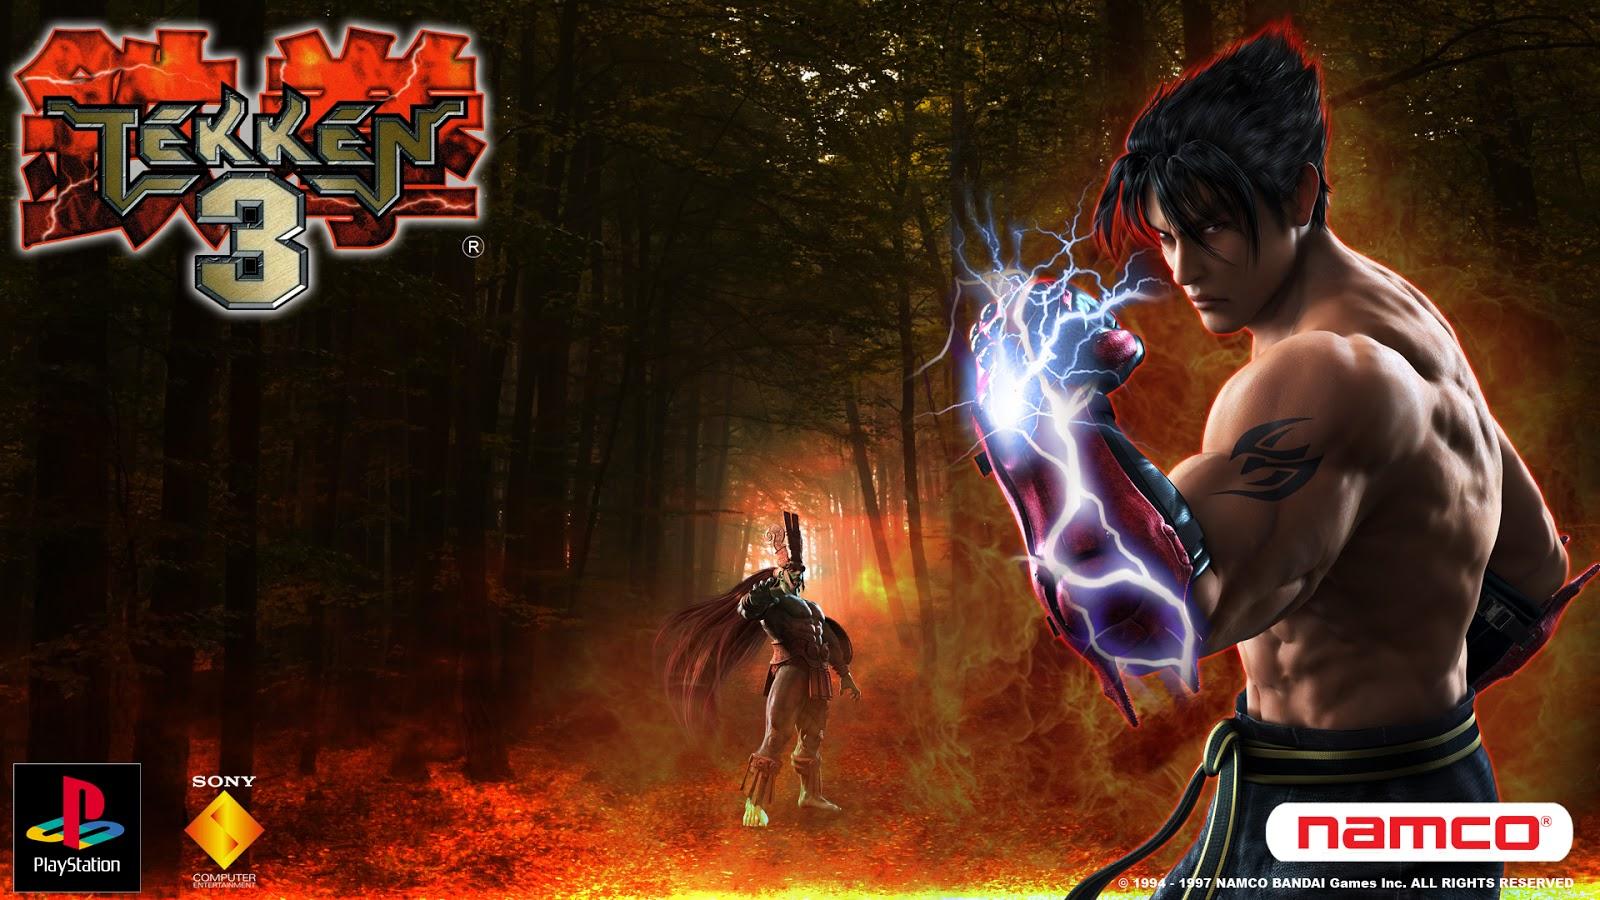 Image result for tekken 3 game free download for pc setup softonic